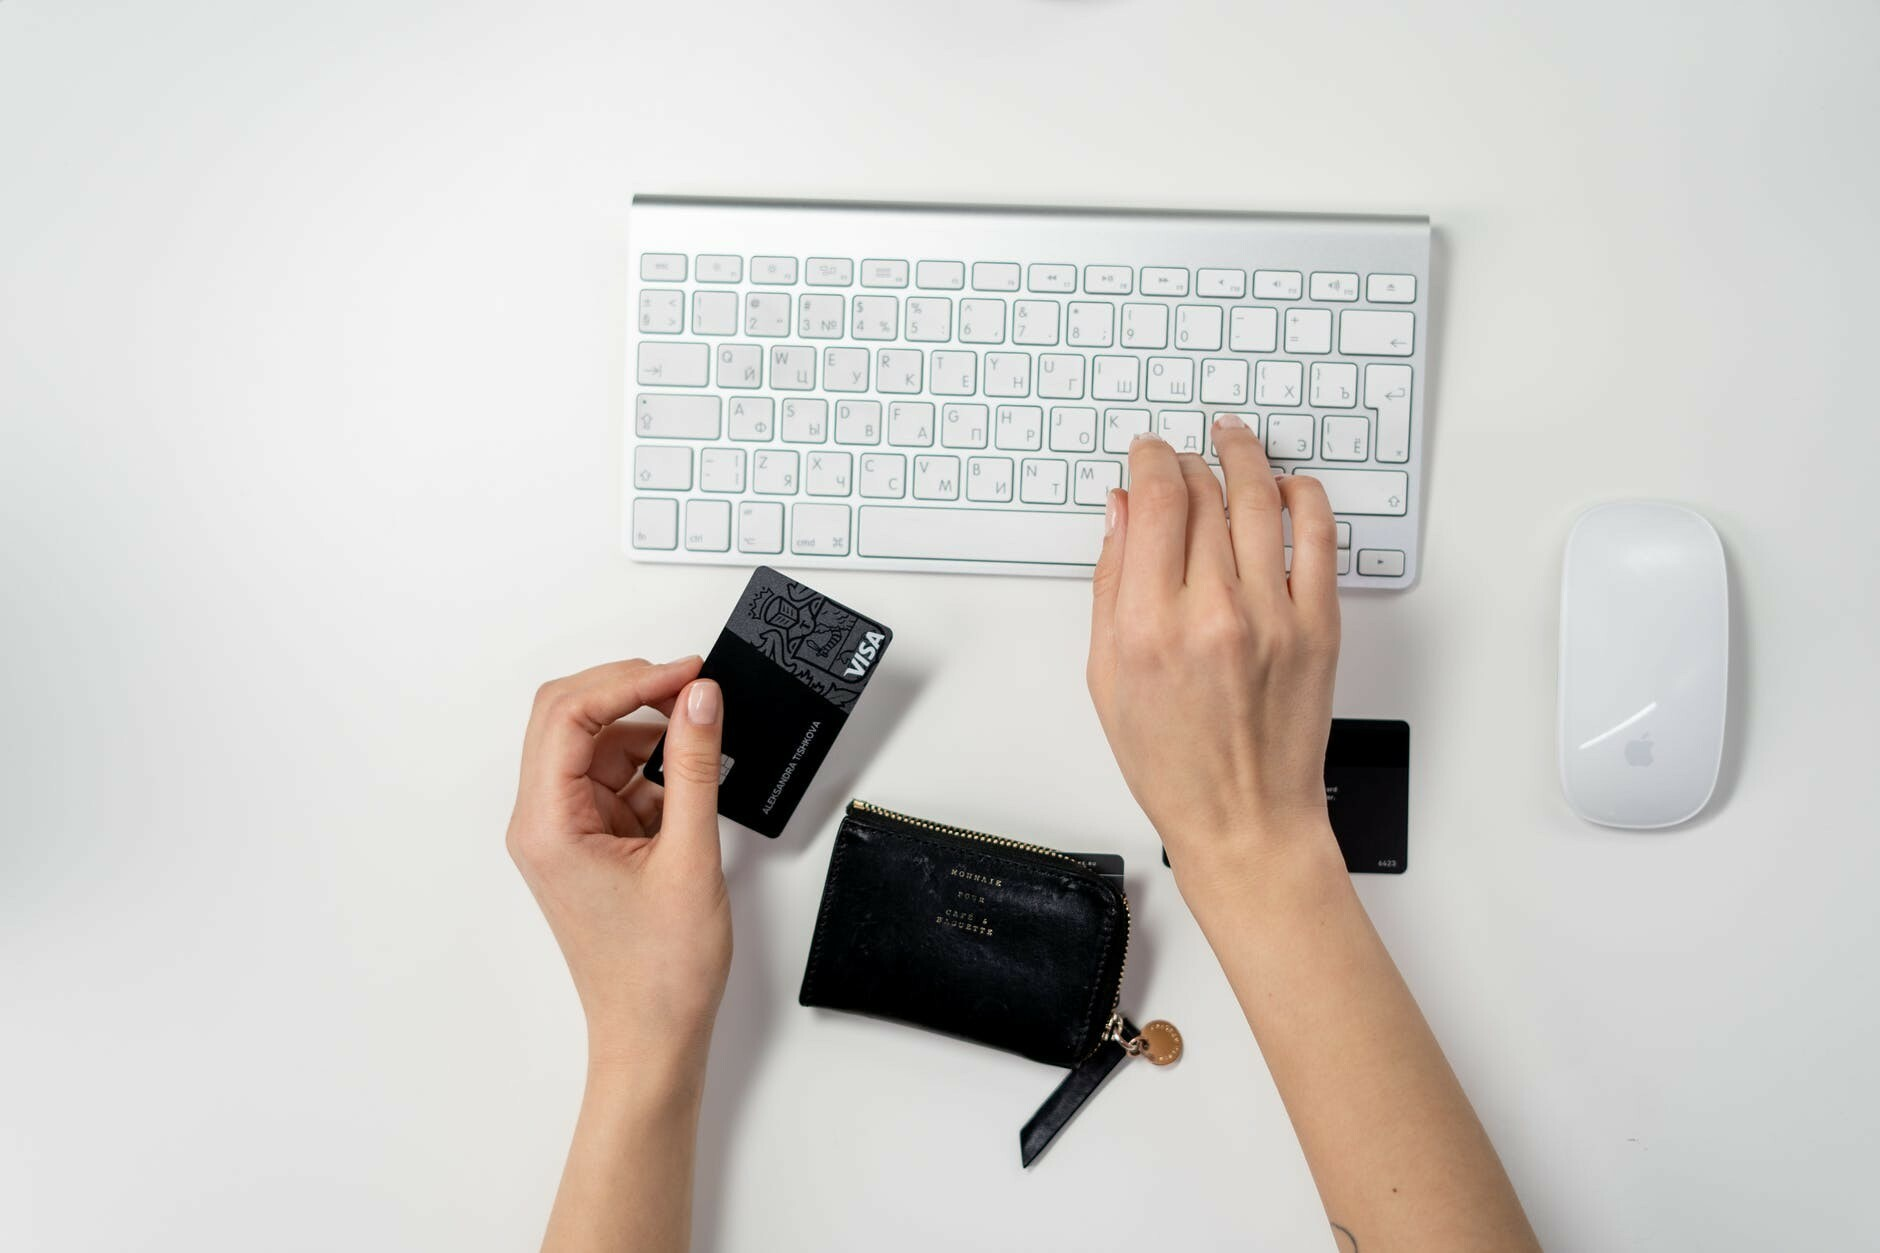 Moyen de paiement e-commerce